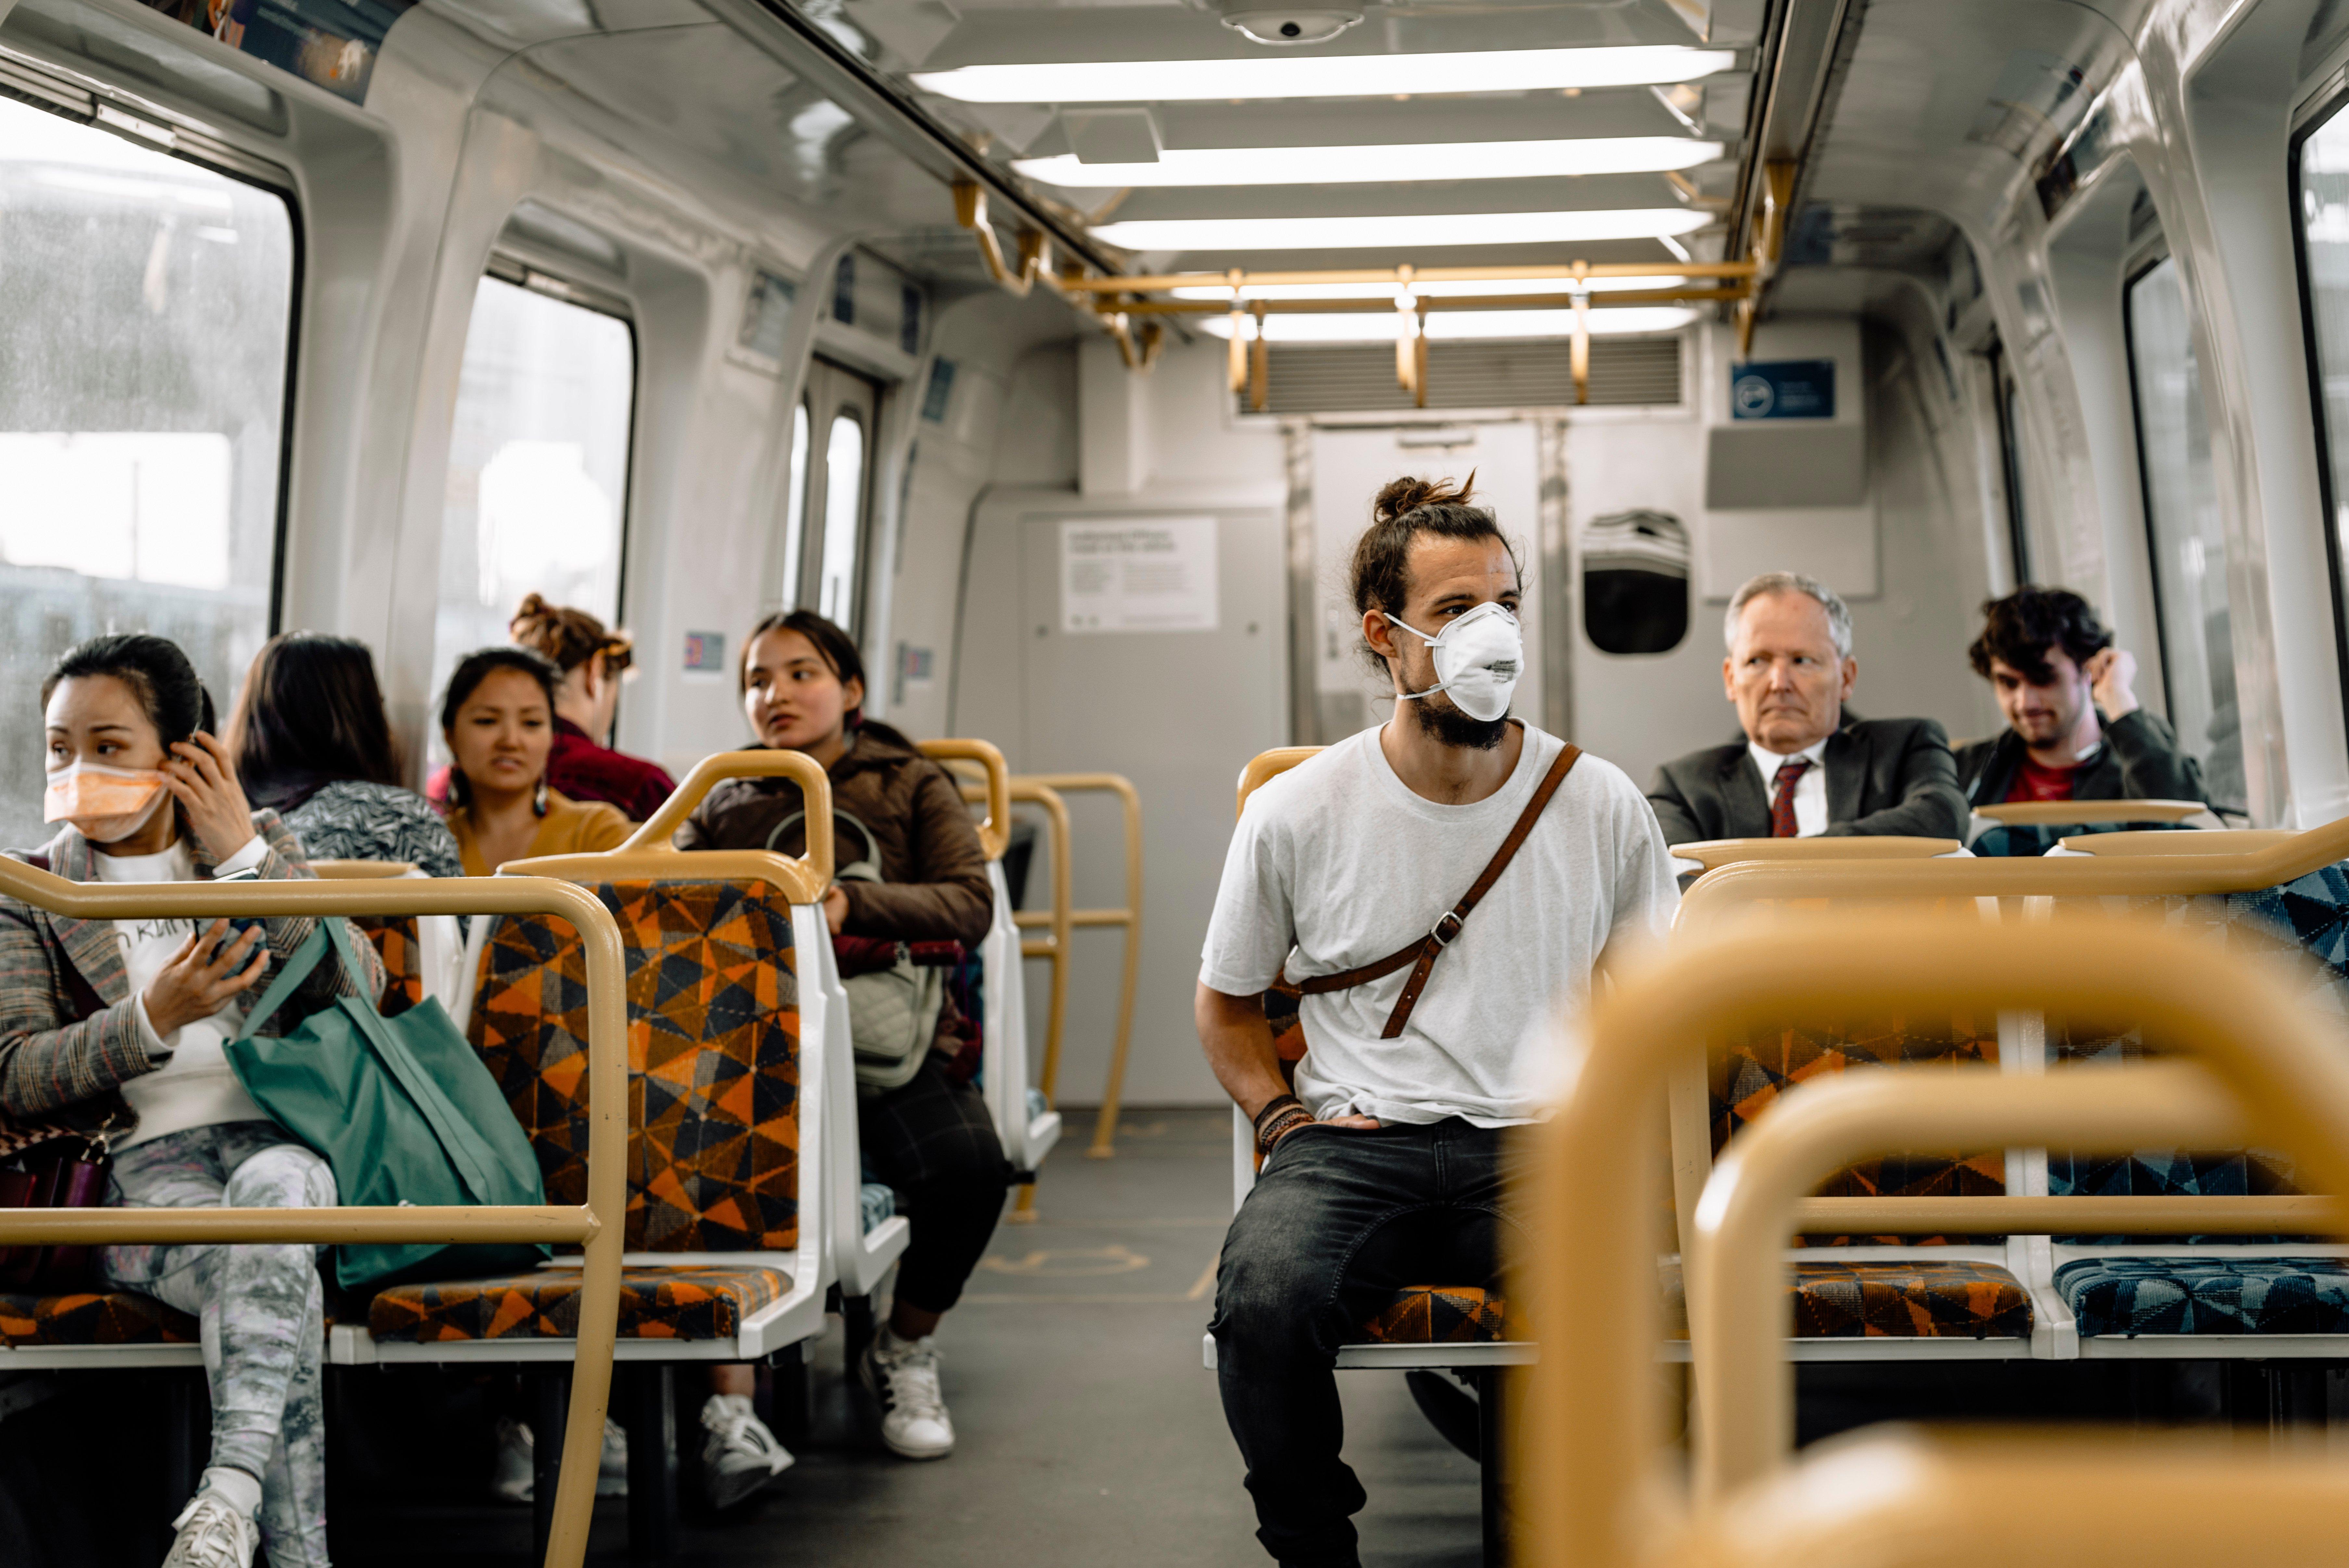 market research transportation masks on train